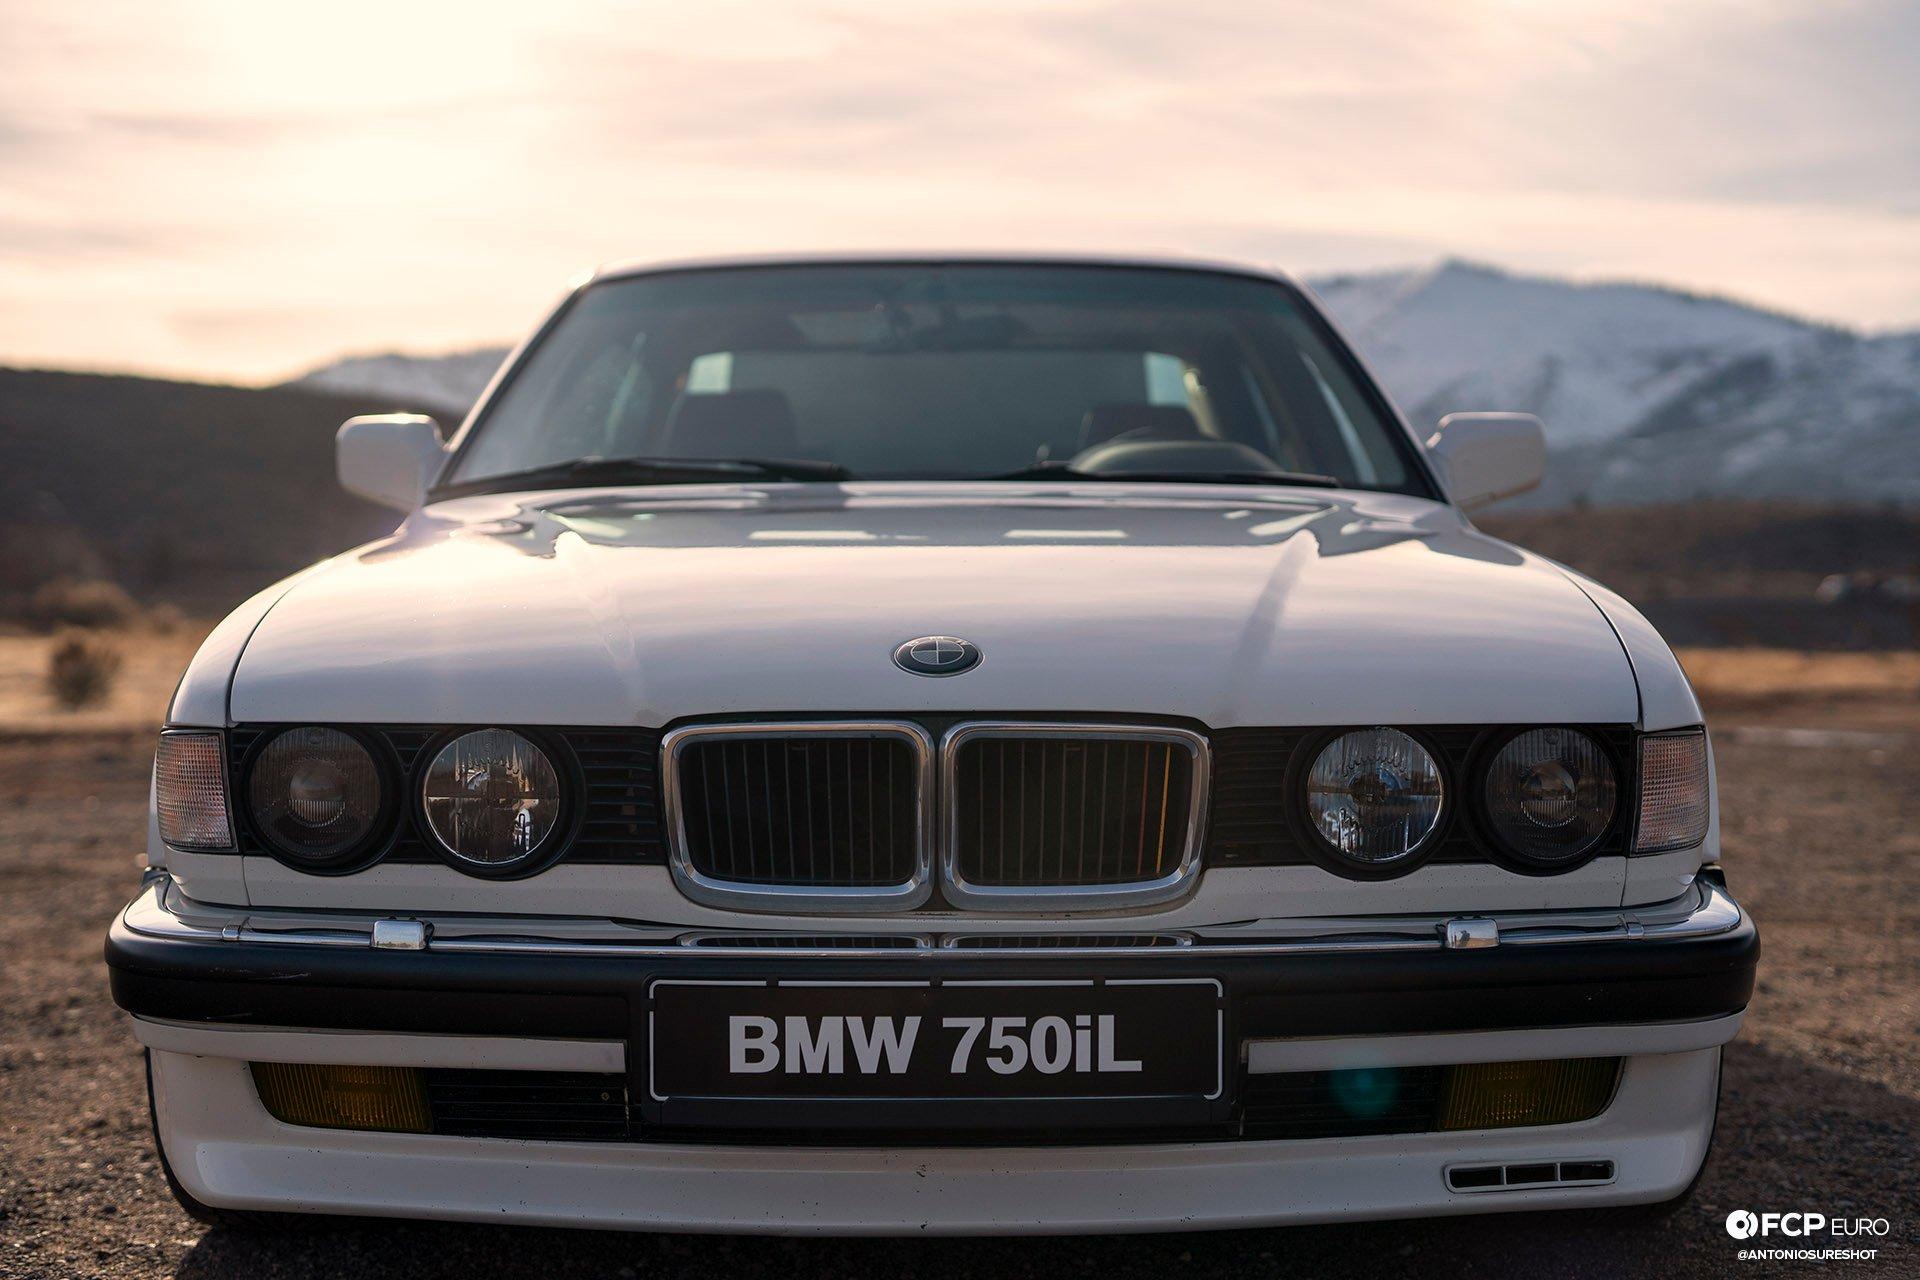 BMW E32 750iL 6 speed A9A02561